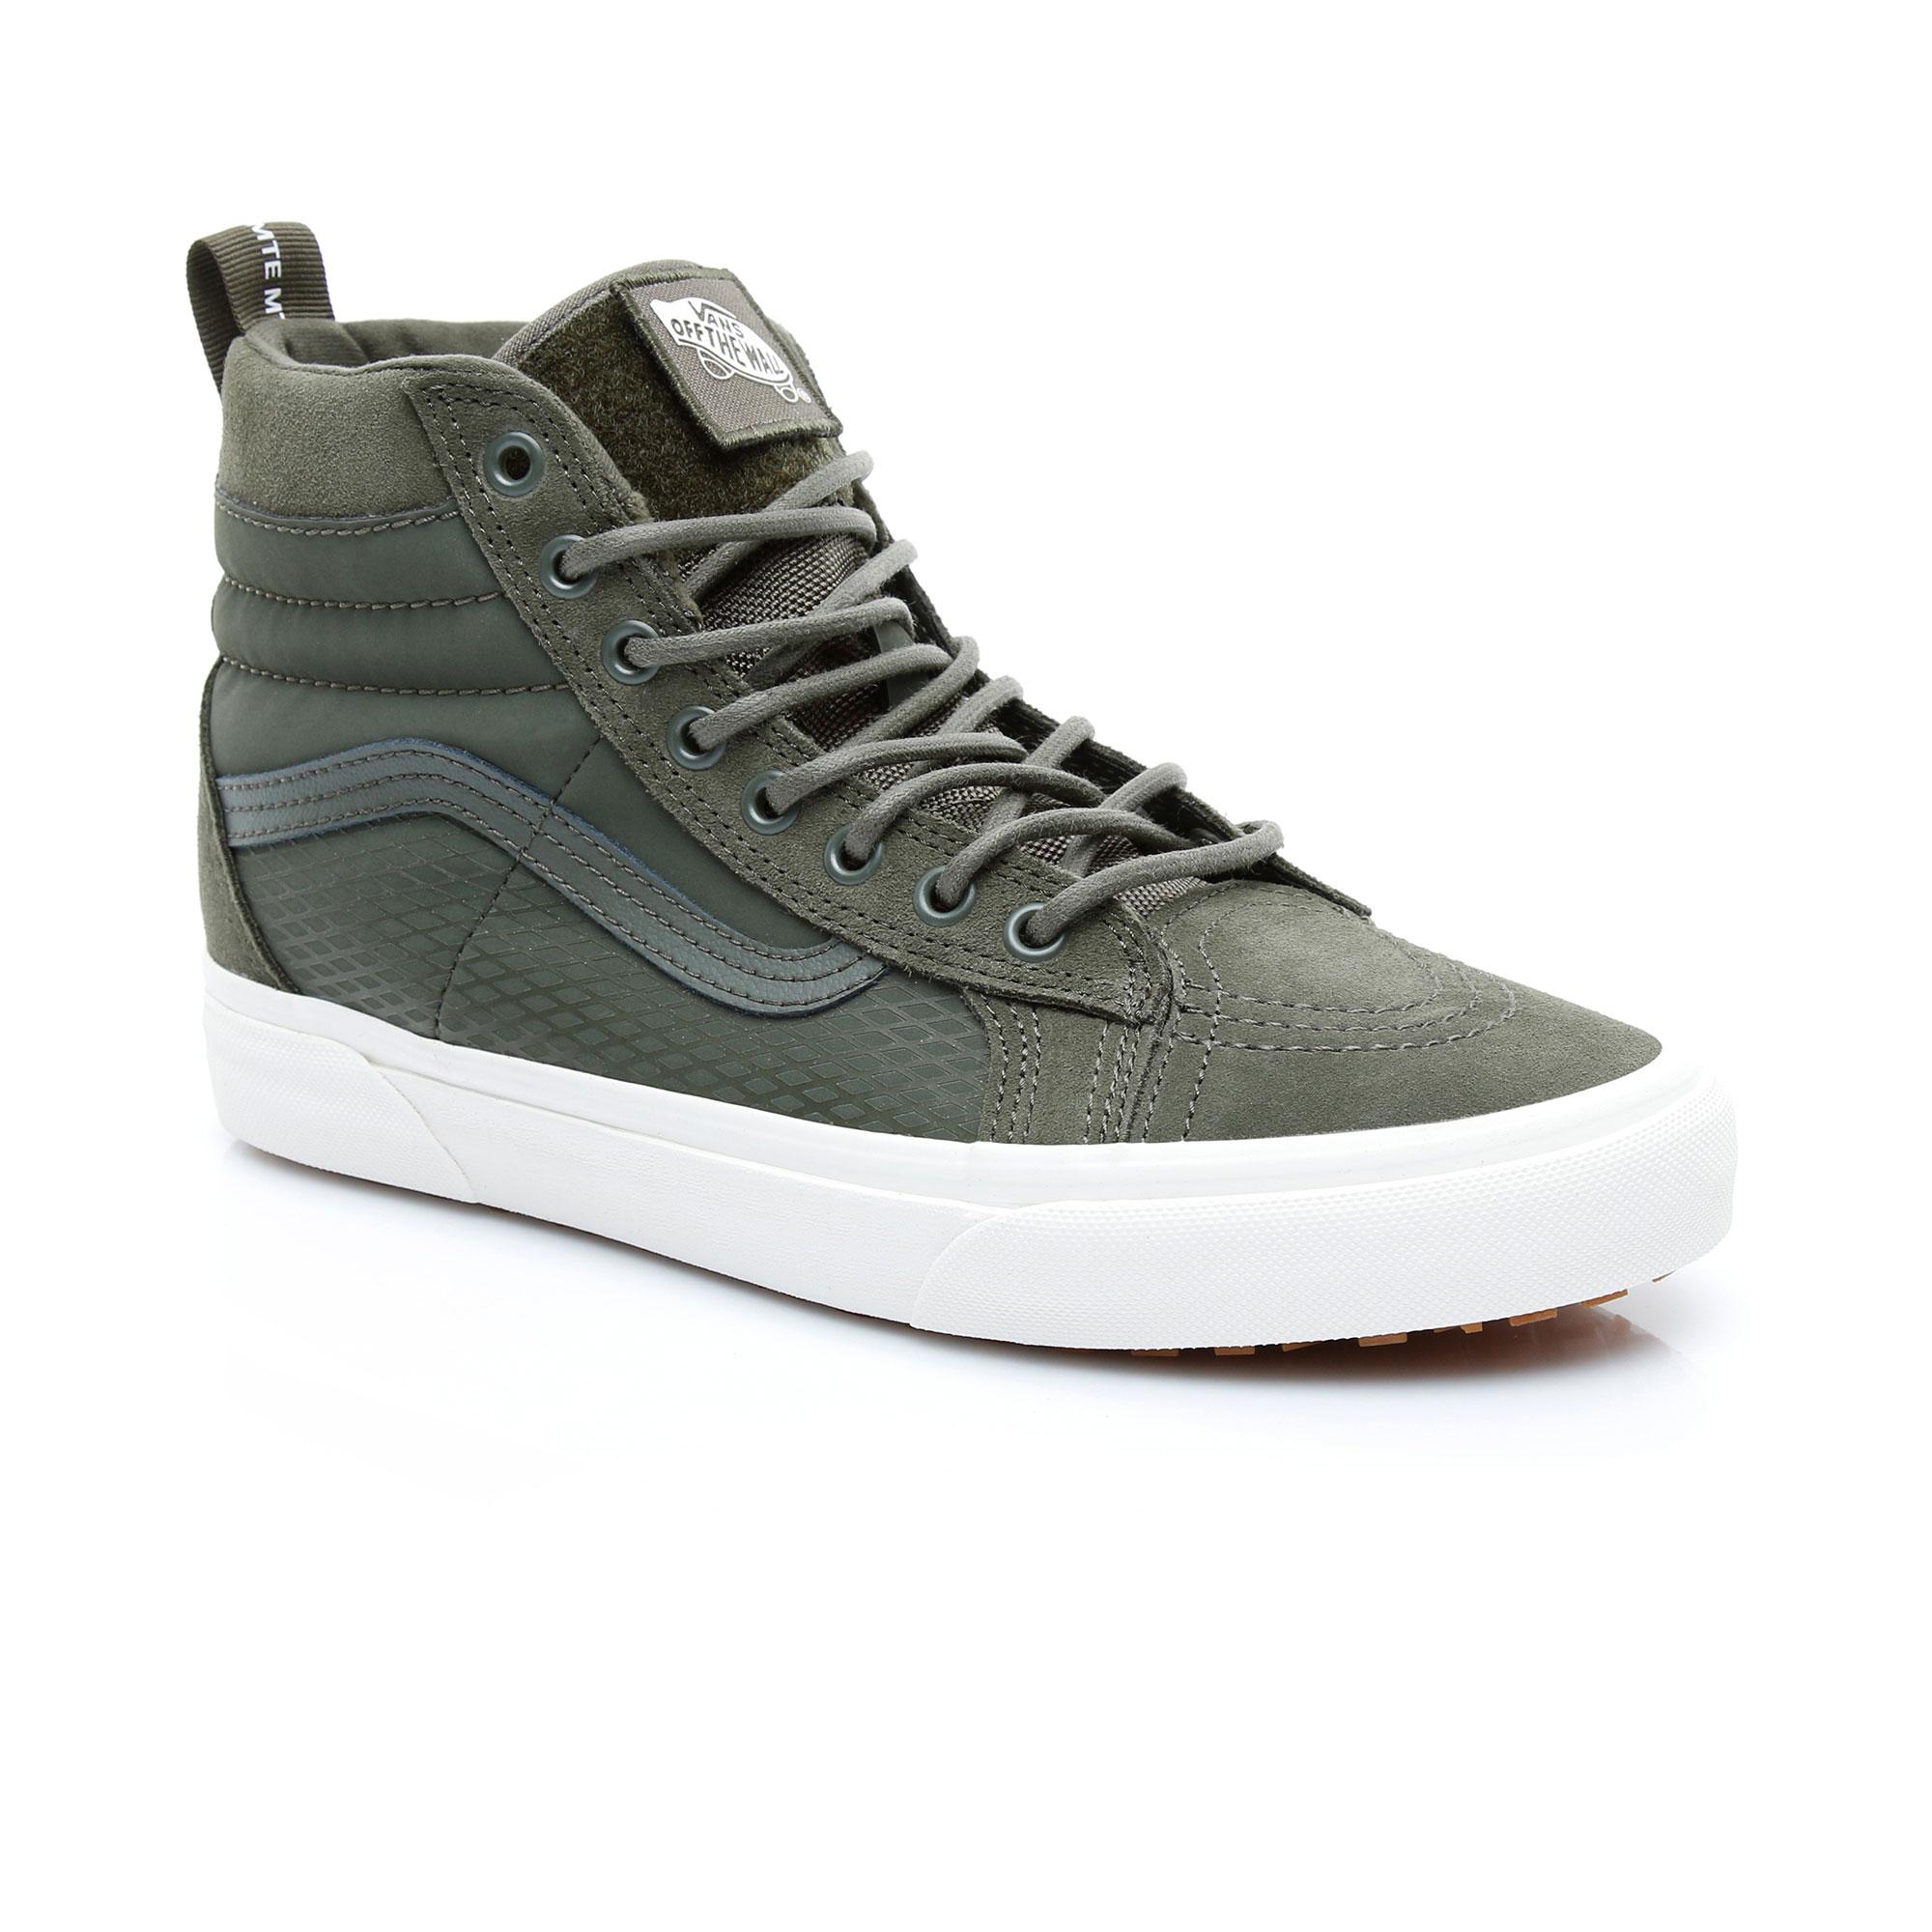 3e25de8f13 Vans UA SK8-Hi 46 MTE DX Yeşil Erkek Sneaker.VN0A3DQ5UBV1.-